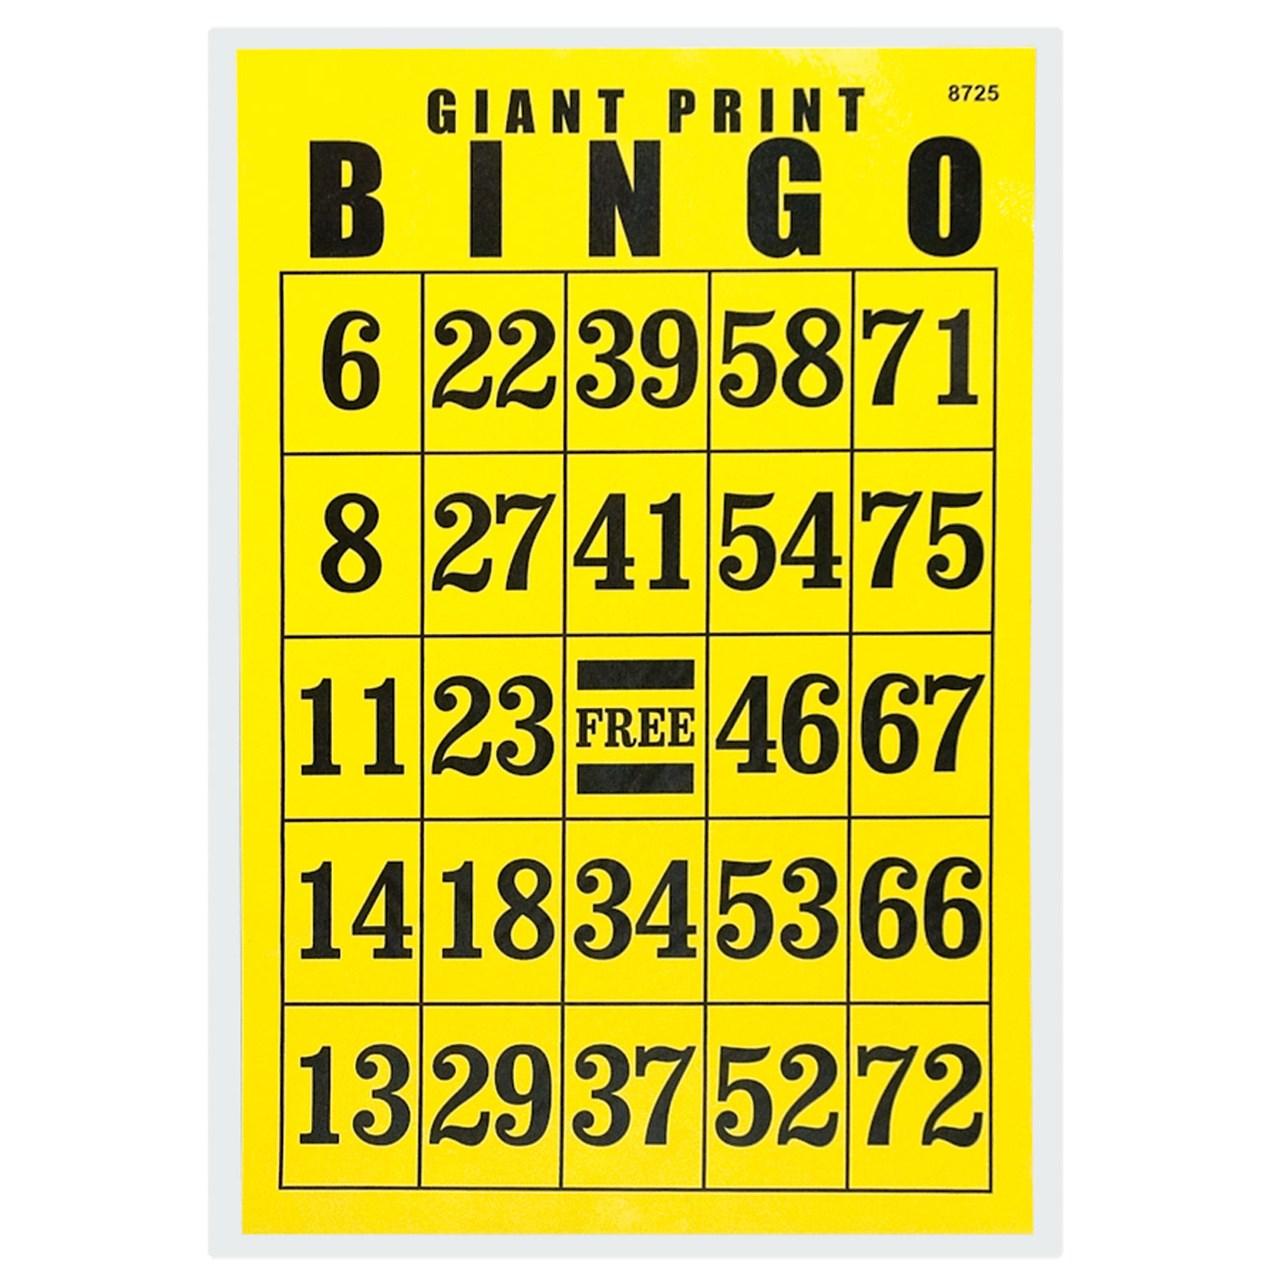 Giant Print Bingo Card - Black on Yellow Background - REDUCED PRICE